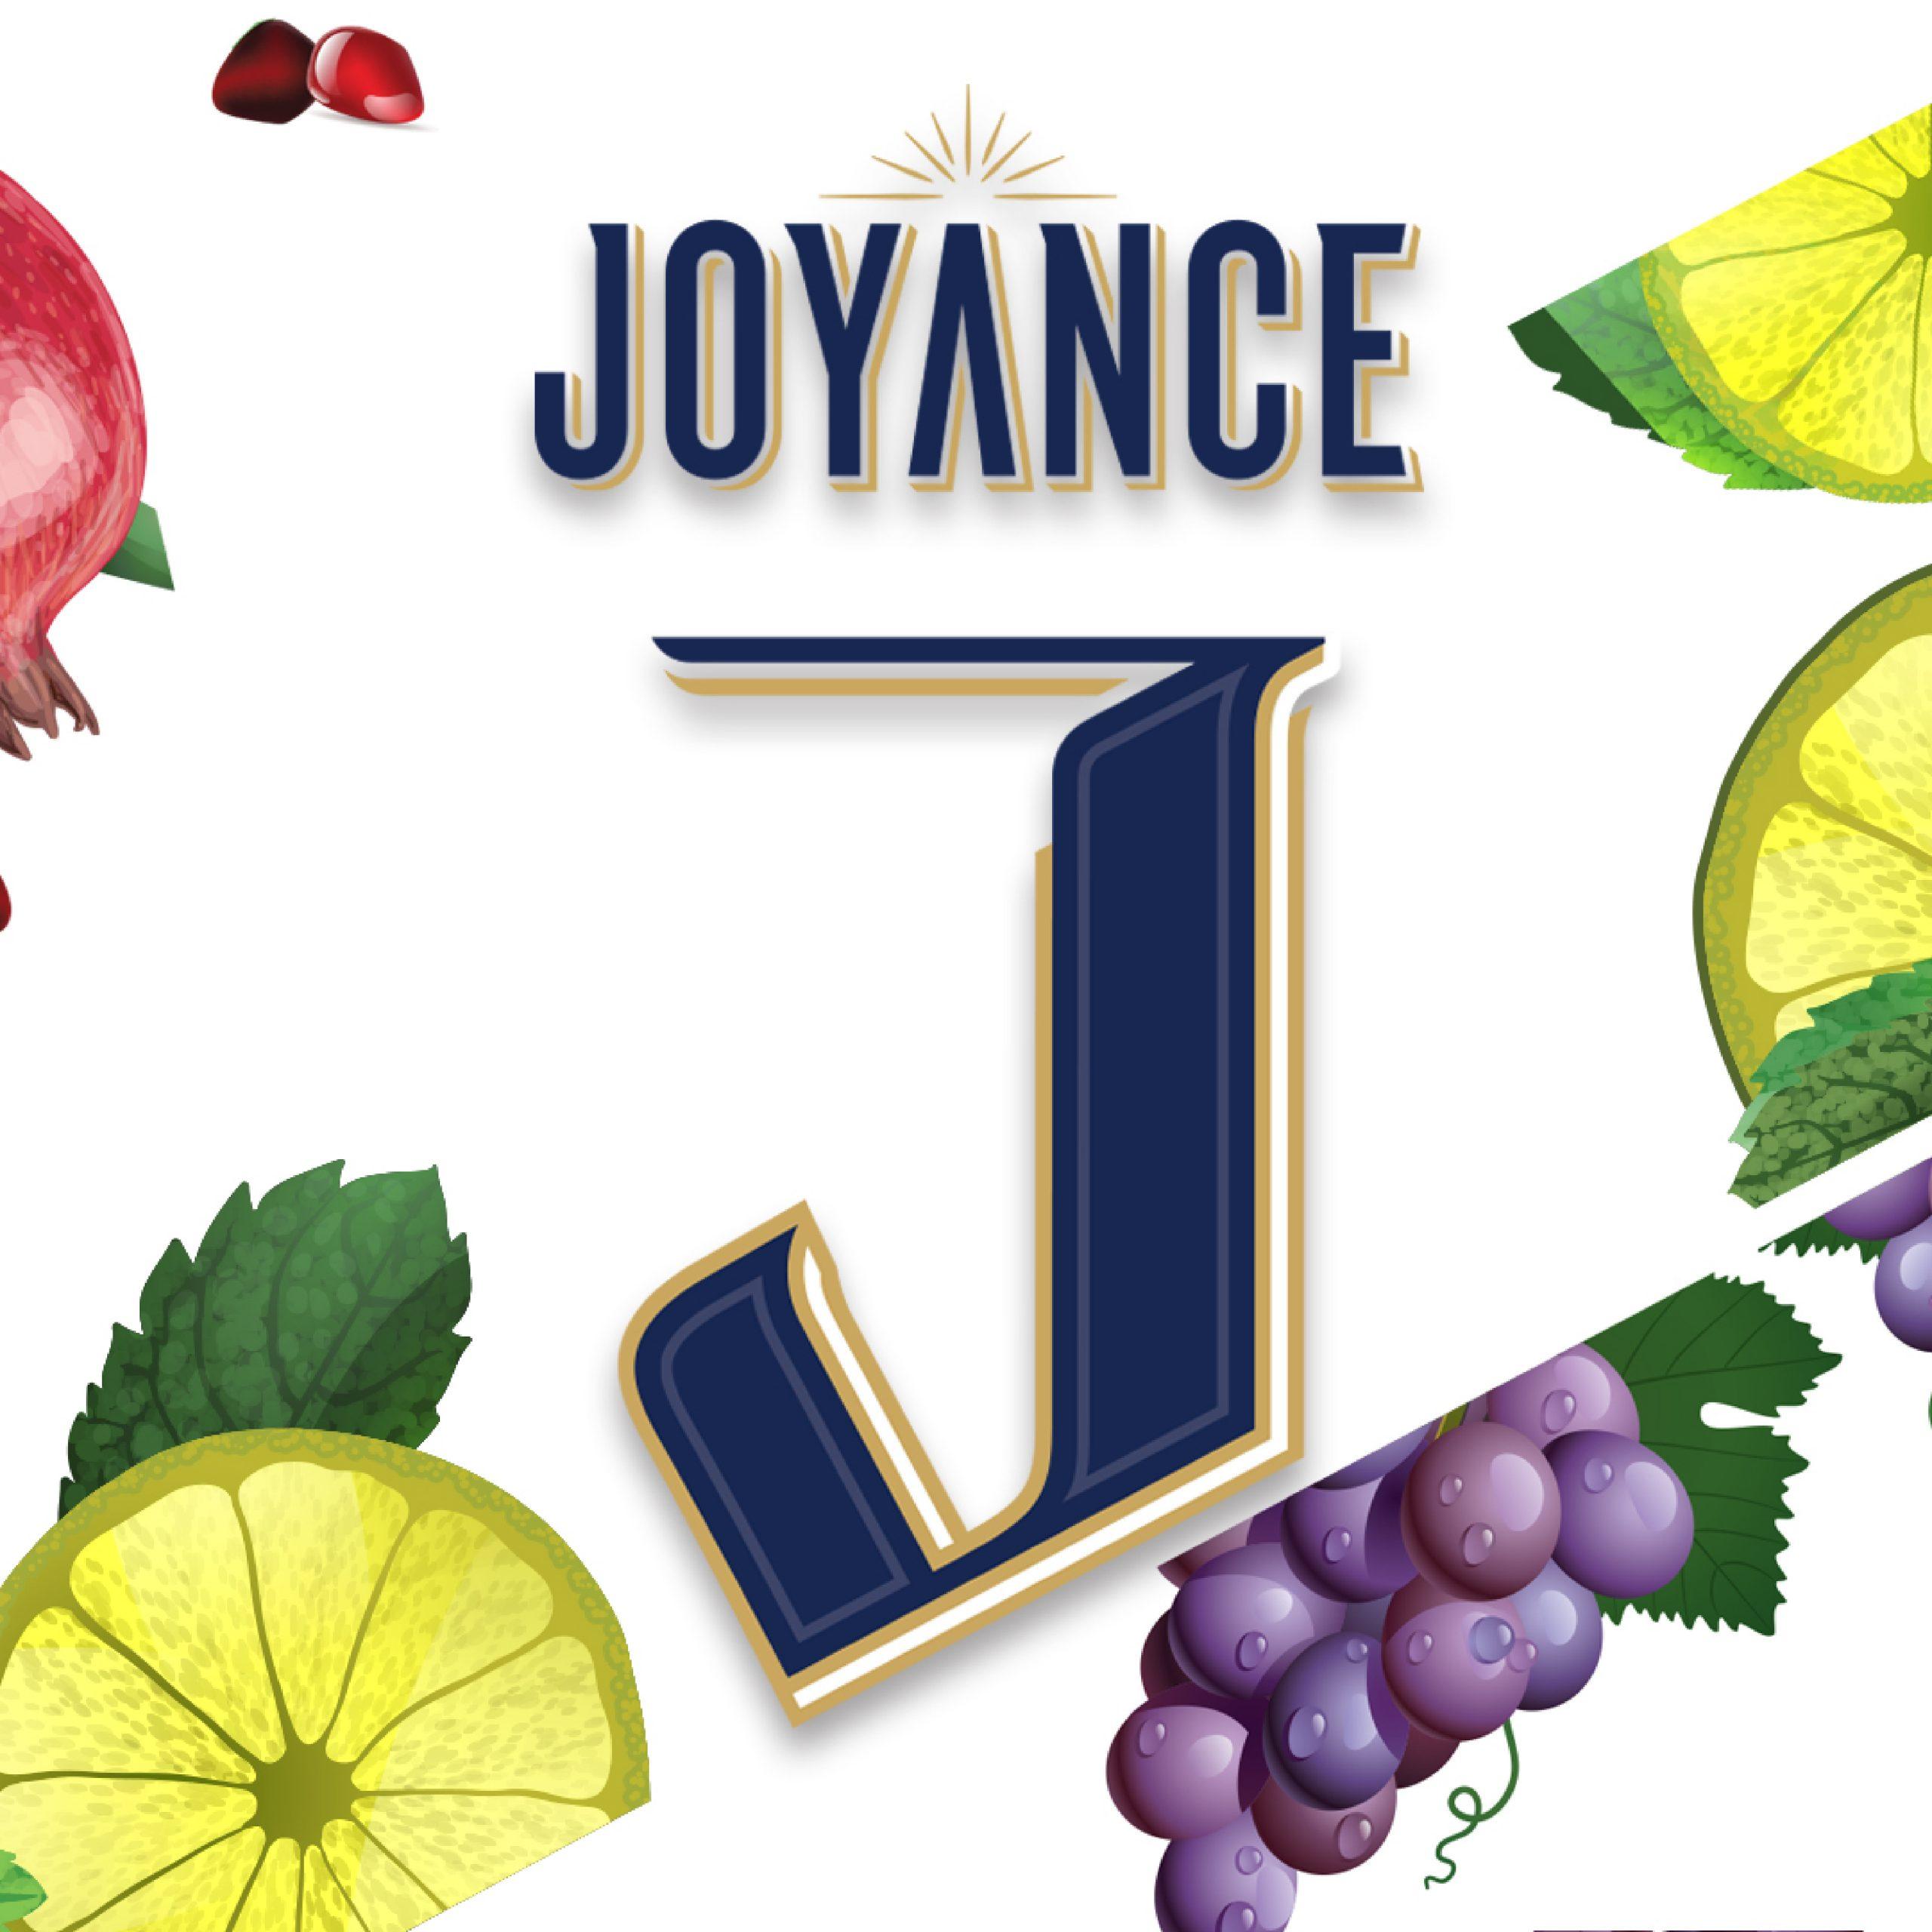 juyance - insta-05